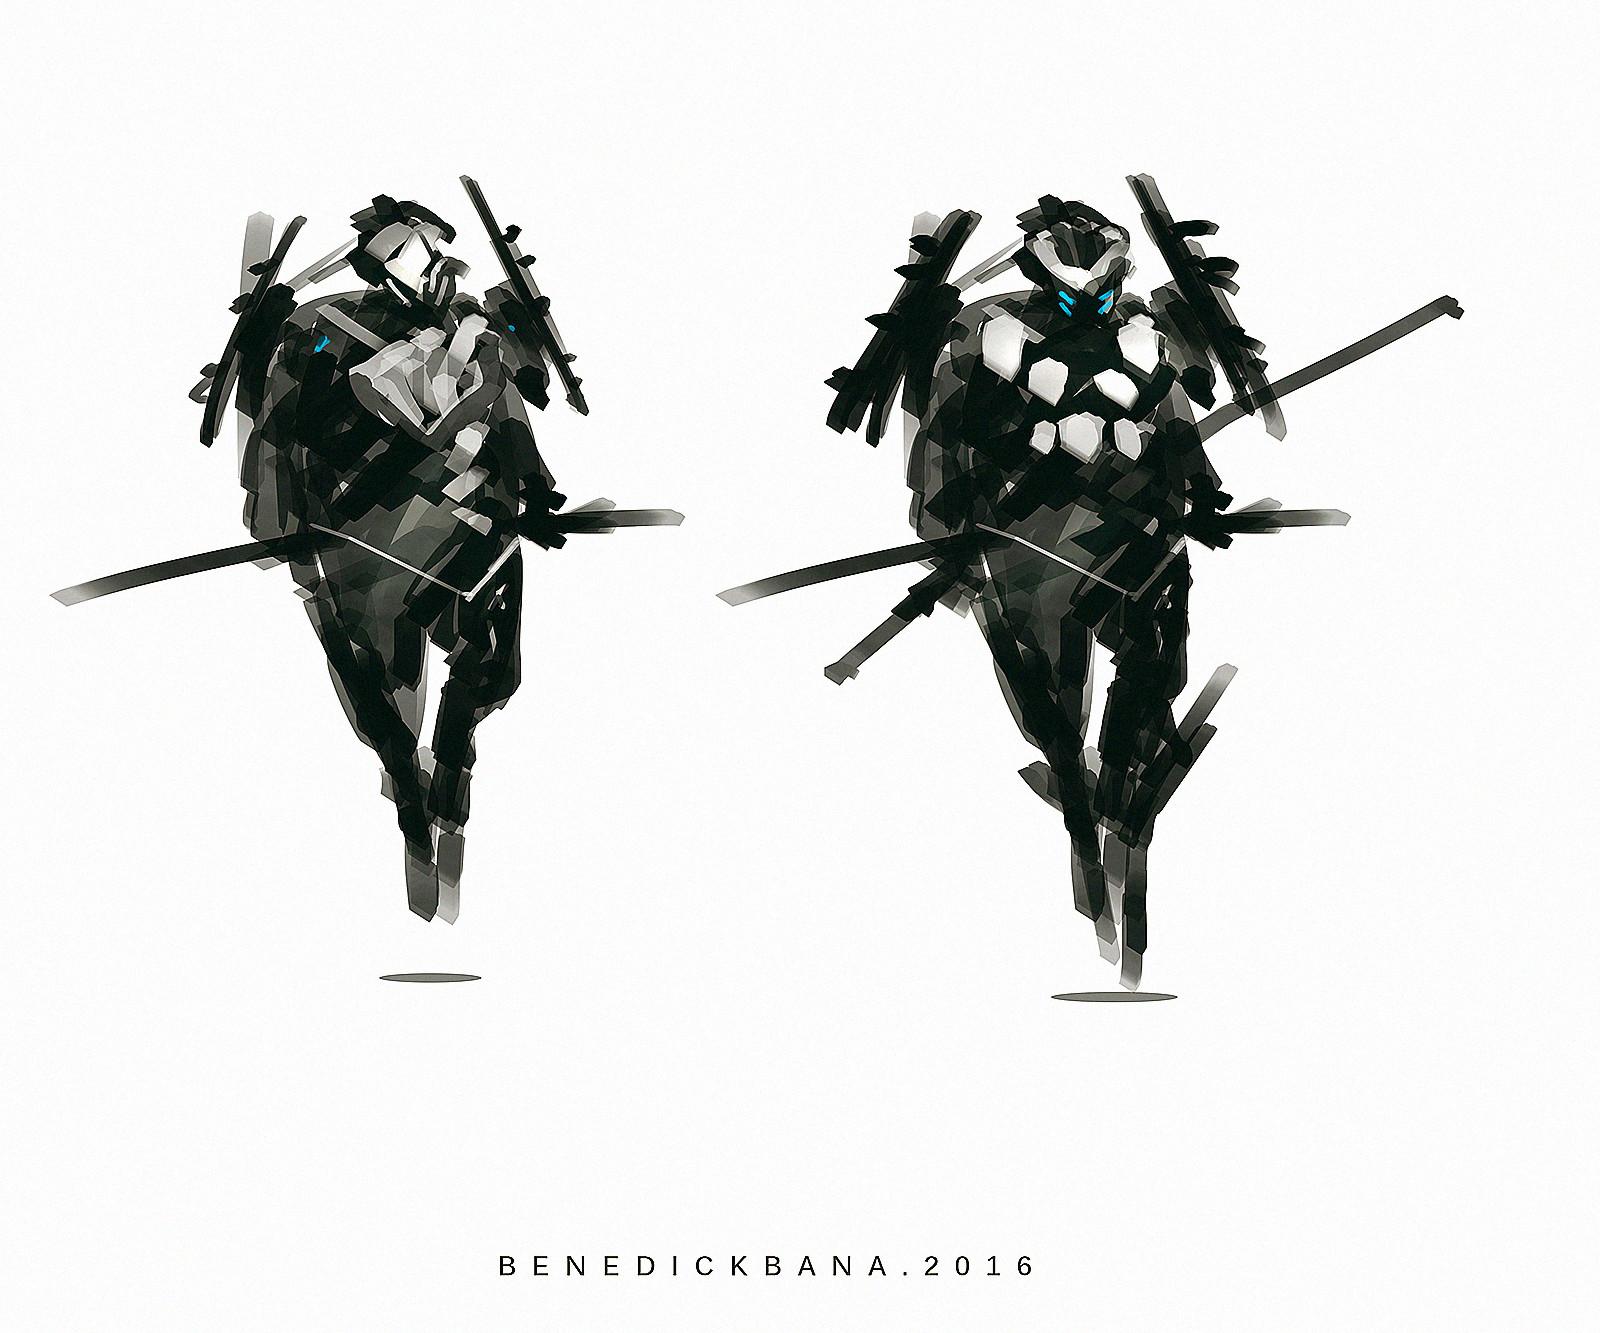 Benedick bana ninjadesign lores